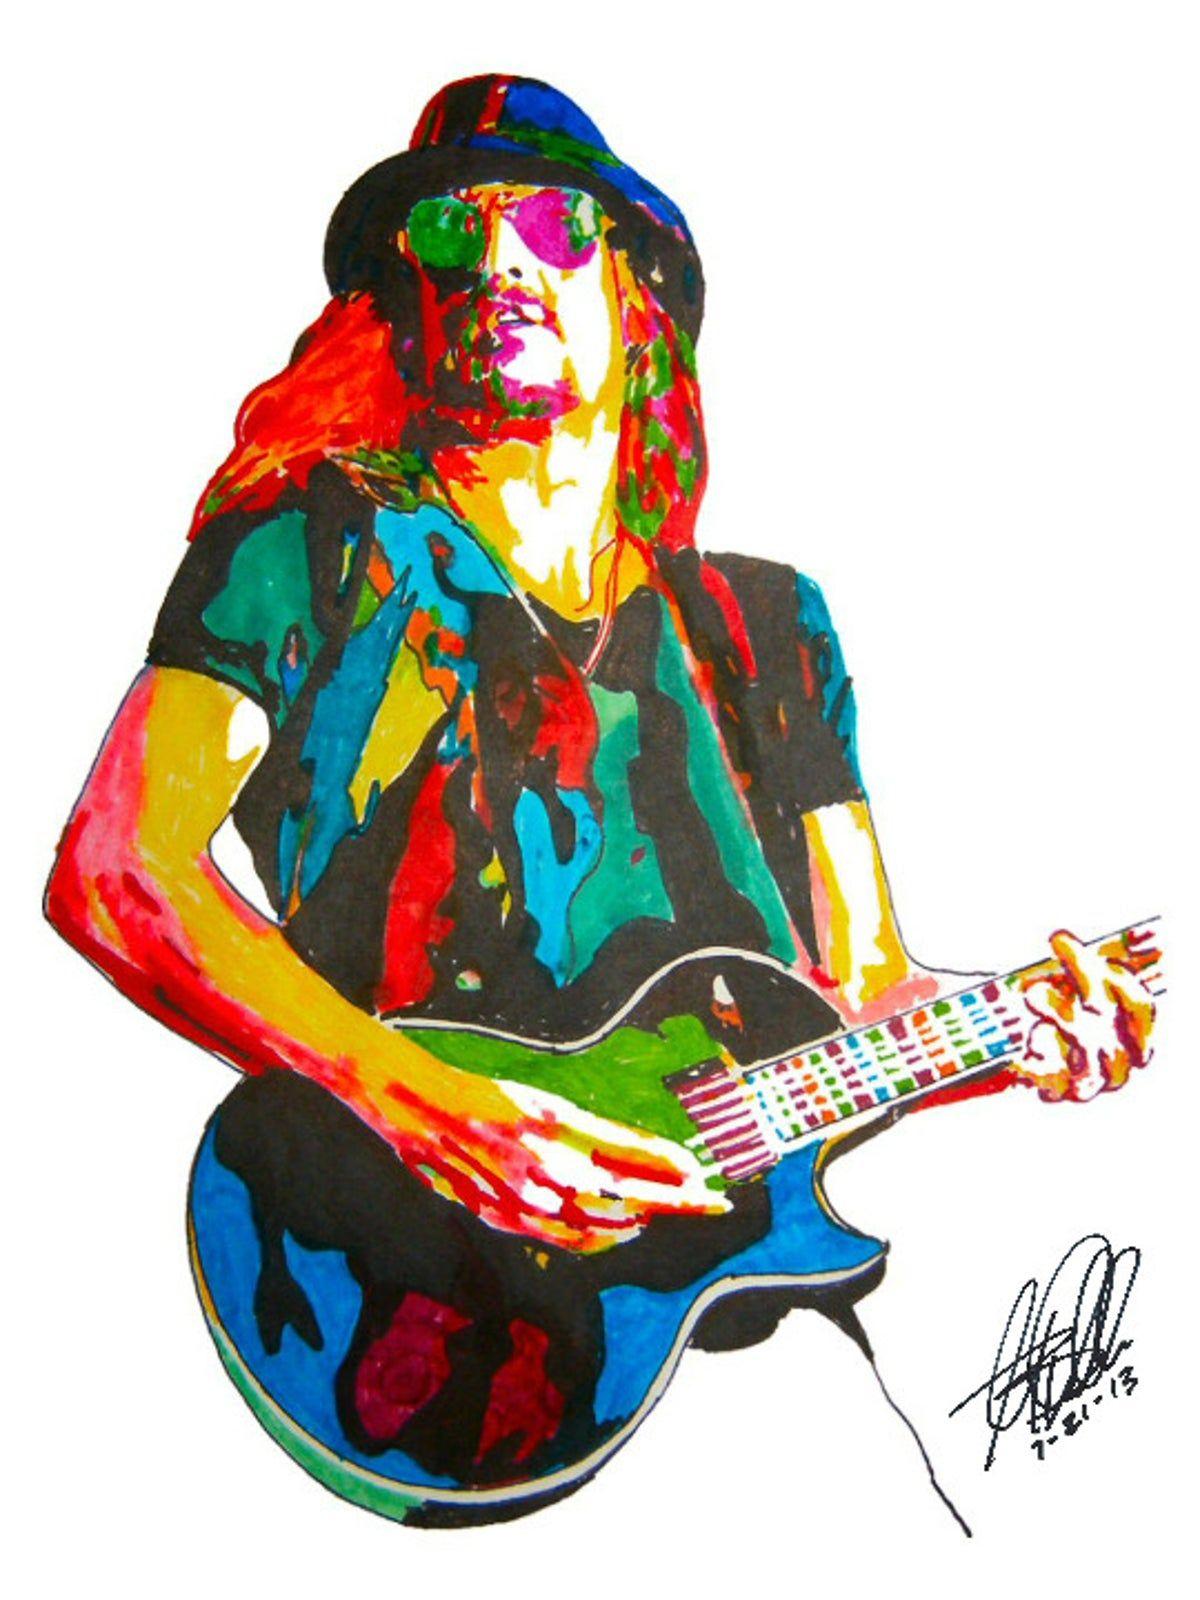 kid rock singer guitar pop music poster